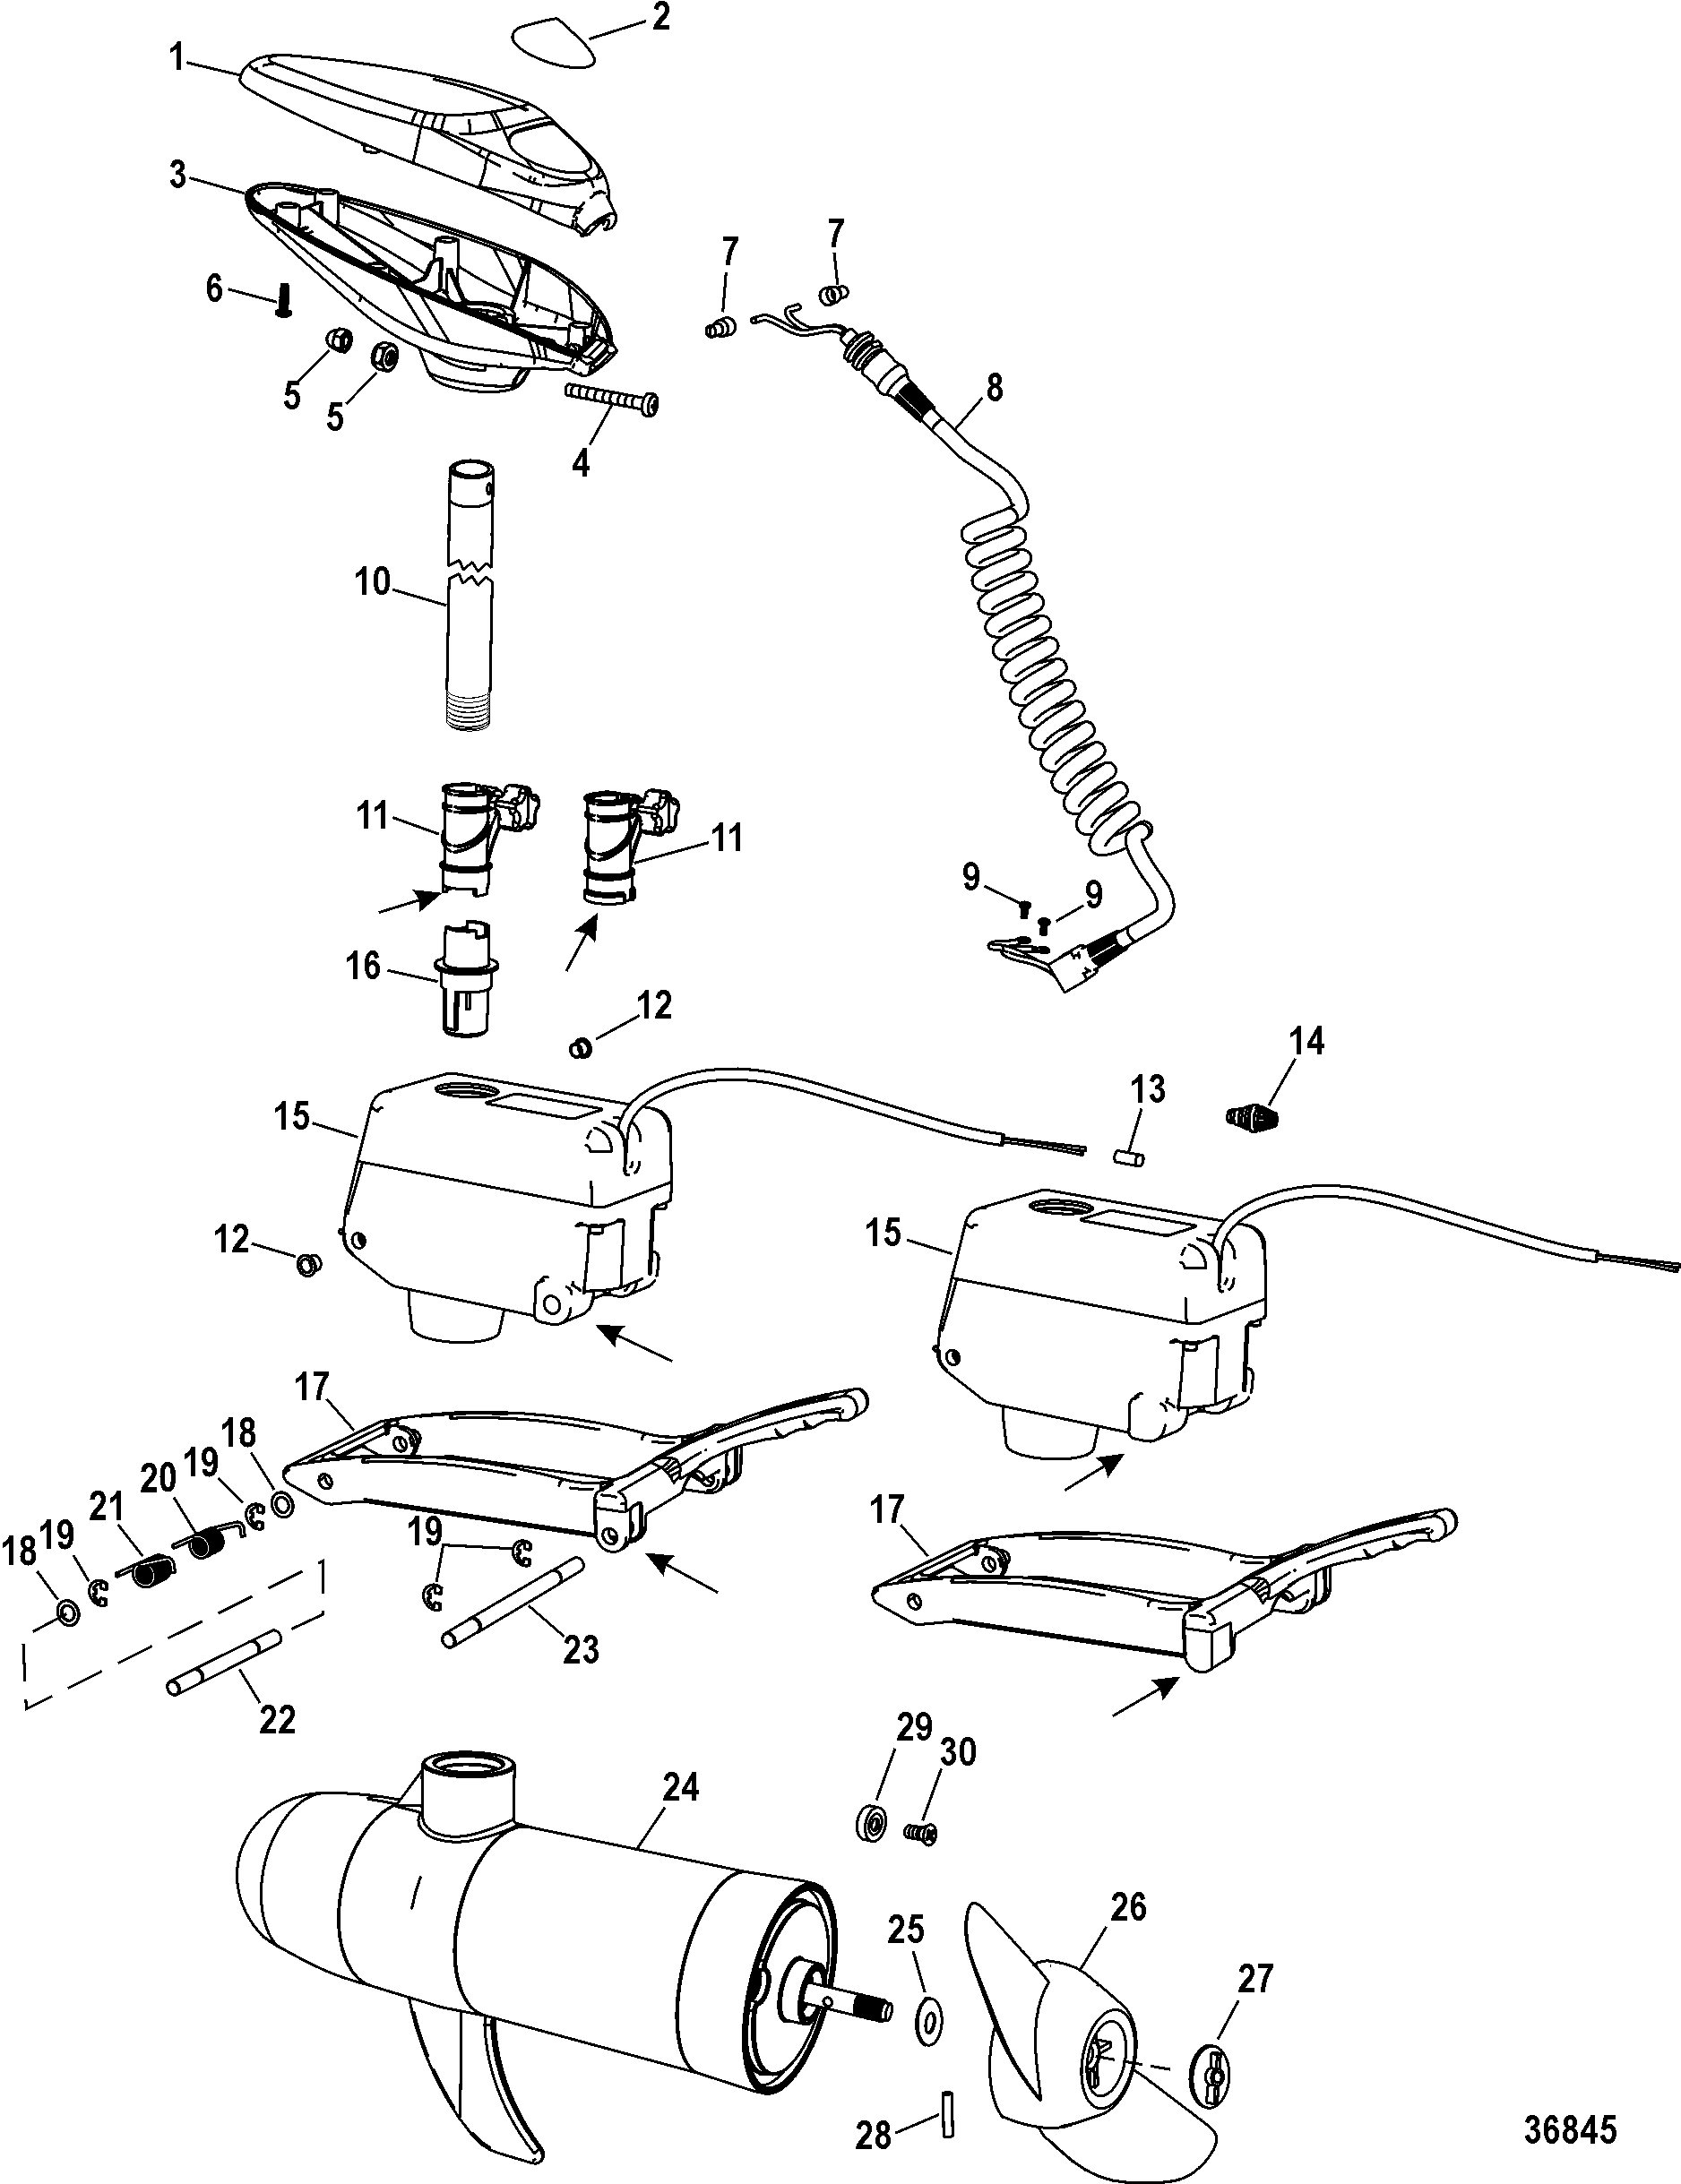 Mercury | TROLLING MOTOR | MotorGuide Wireless Series | 9B920032